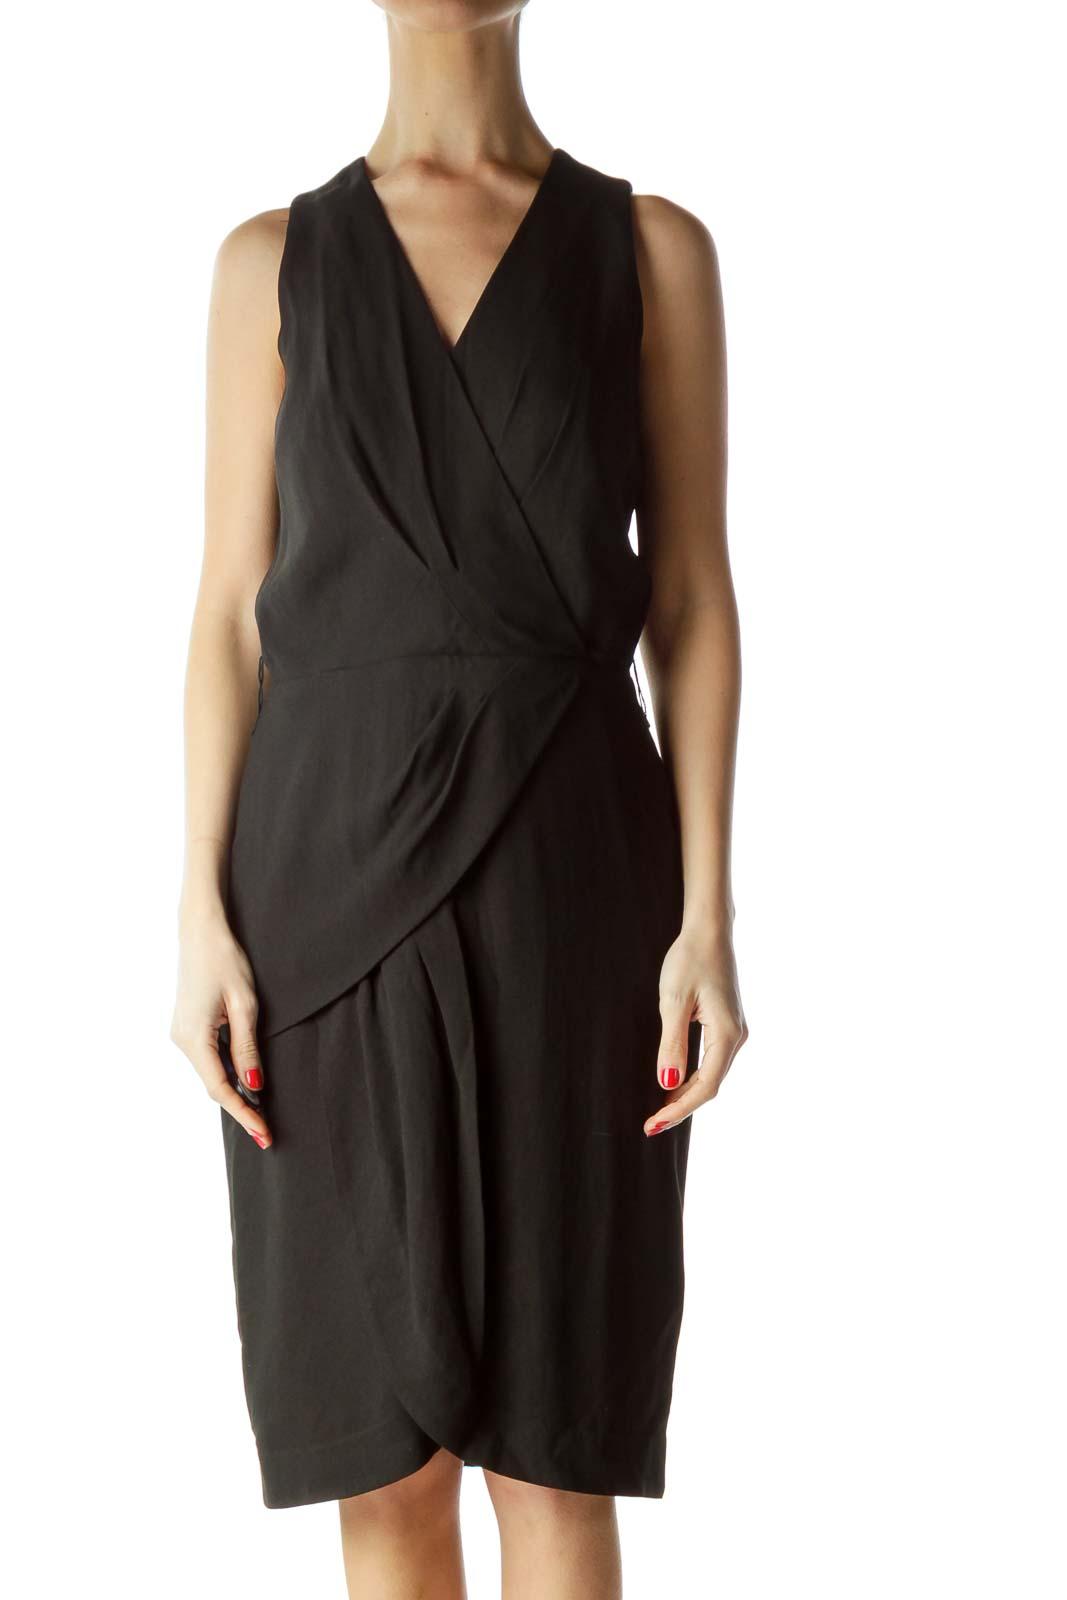 Black Layered V-Neck Work Dress